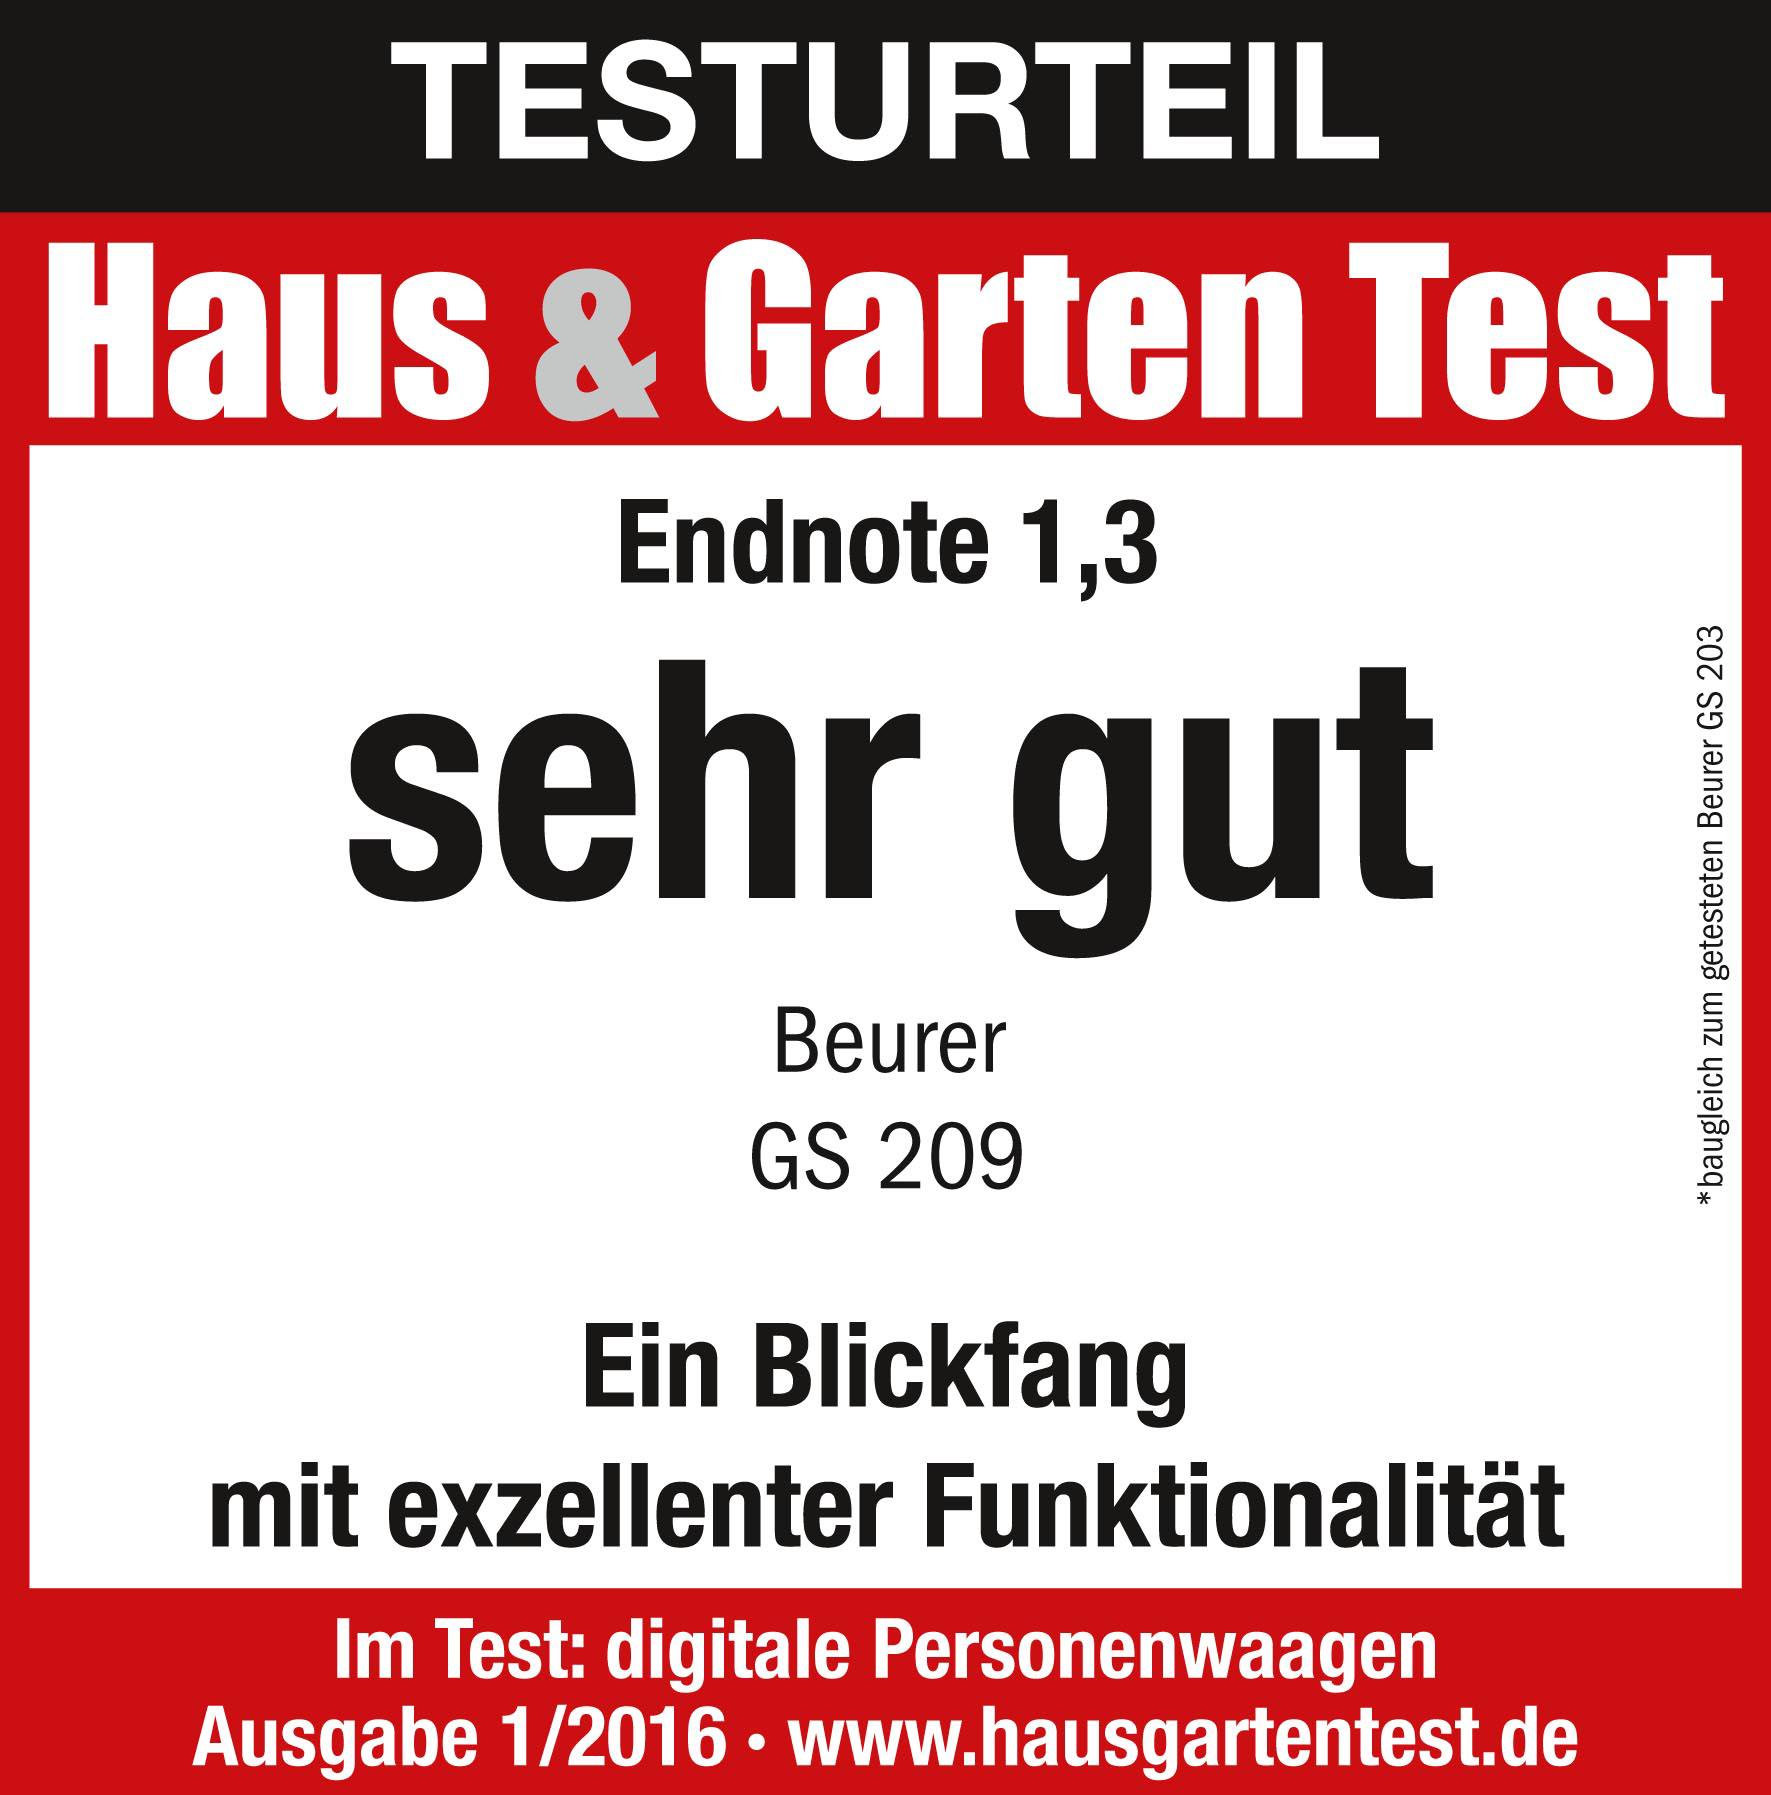 https://www.beurer-shop.de/media/images/attributevalueimages/gs209_haus-garten_sehrgut_0116.png